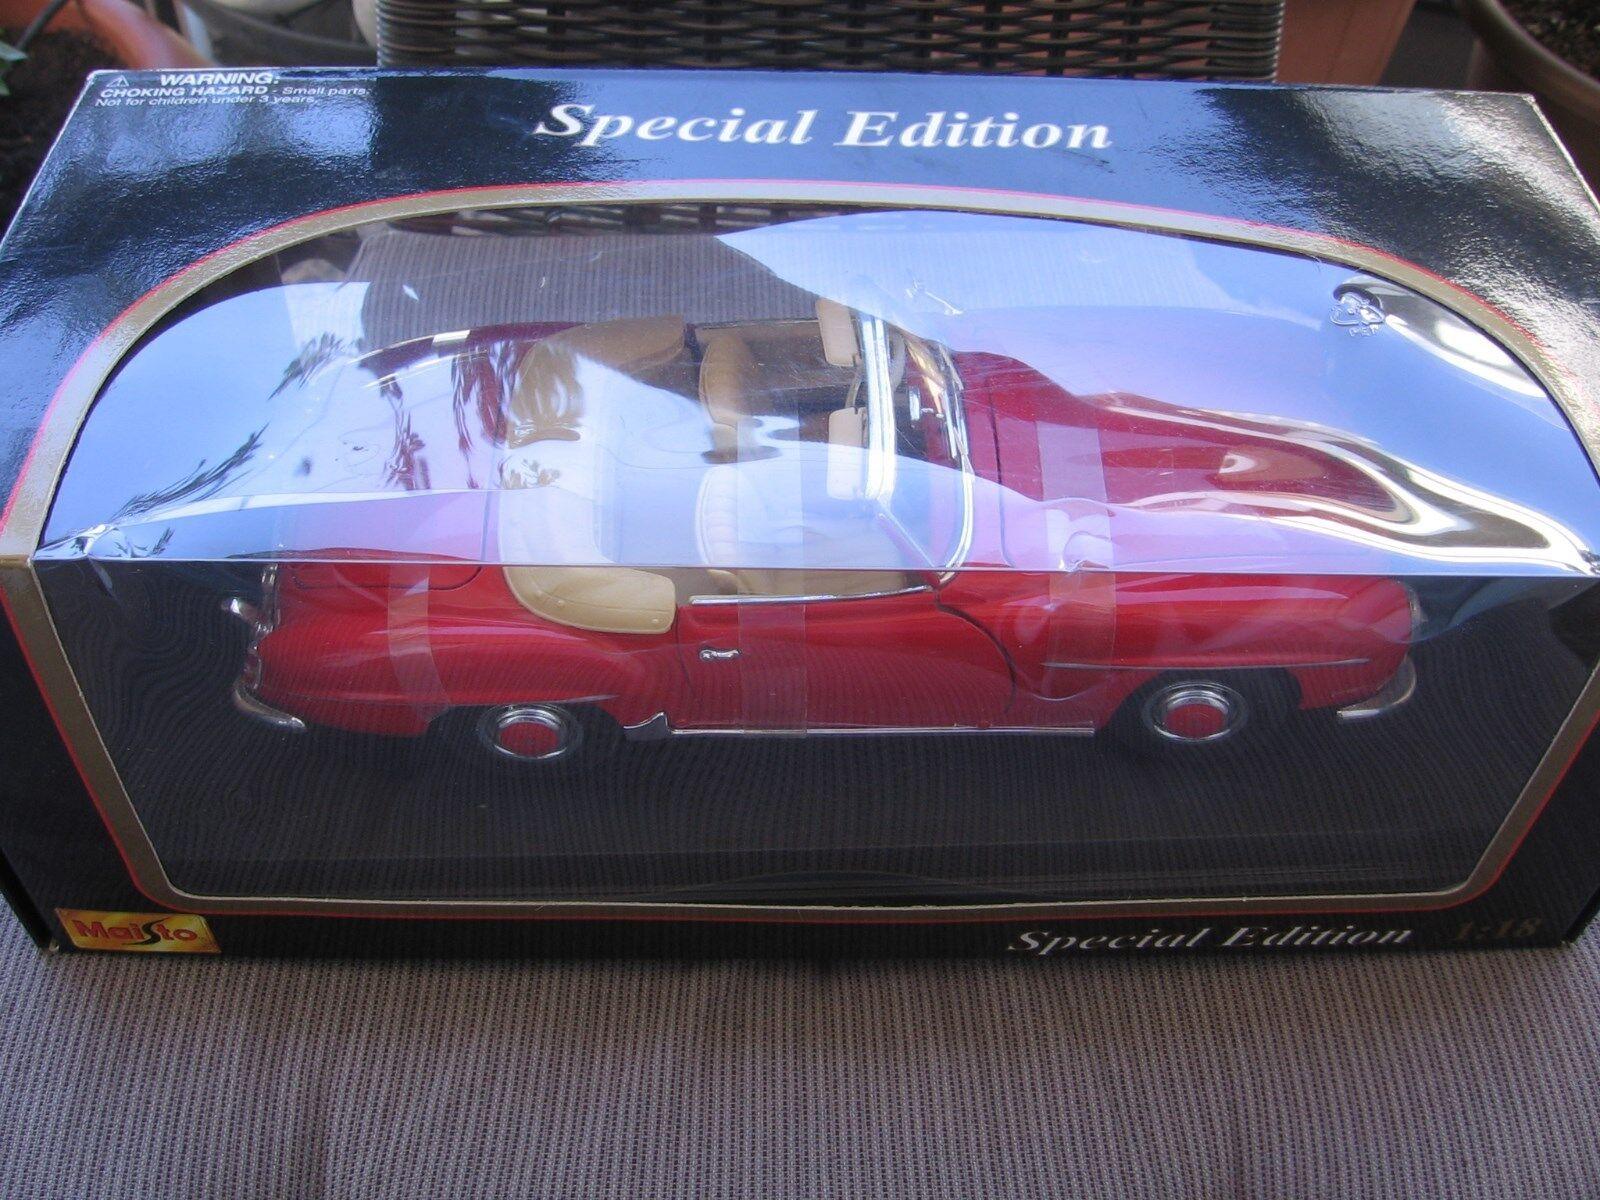 mas preferencial Mercedes-benz 190sl 1955 rojo roadster 1 18 maisto OVP & & & New   orden ahora disfrutar de gran descuento